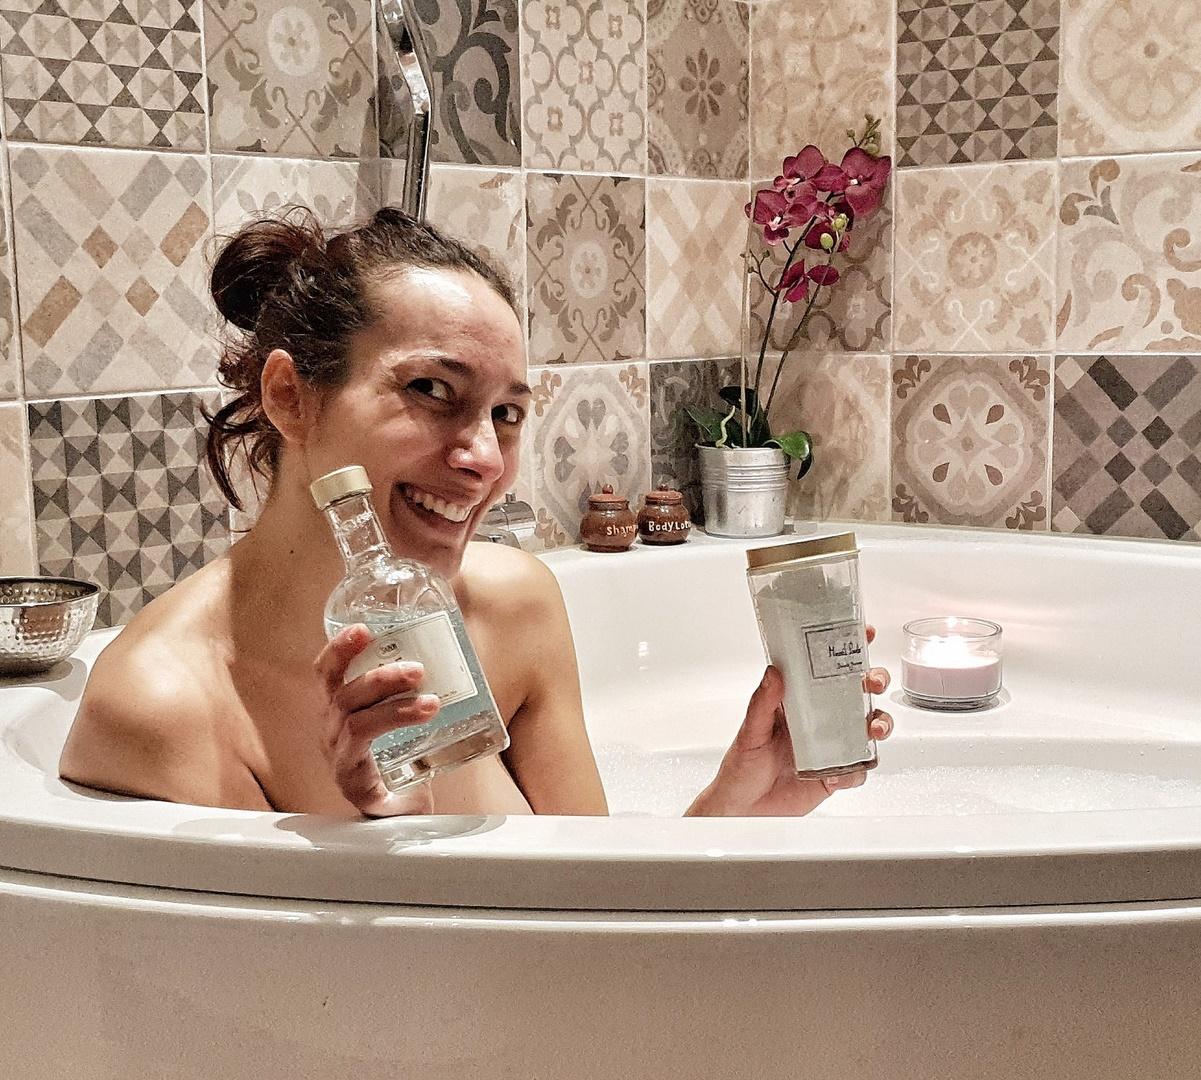 jenychooz l'art du bain sabon produits naturels